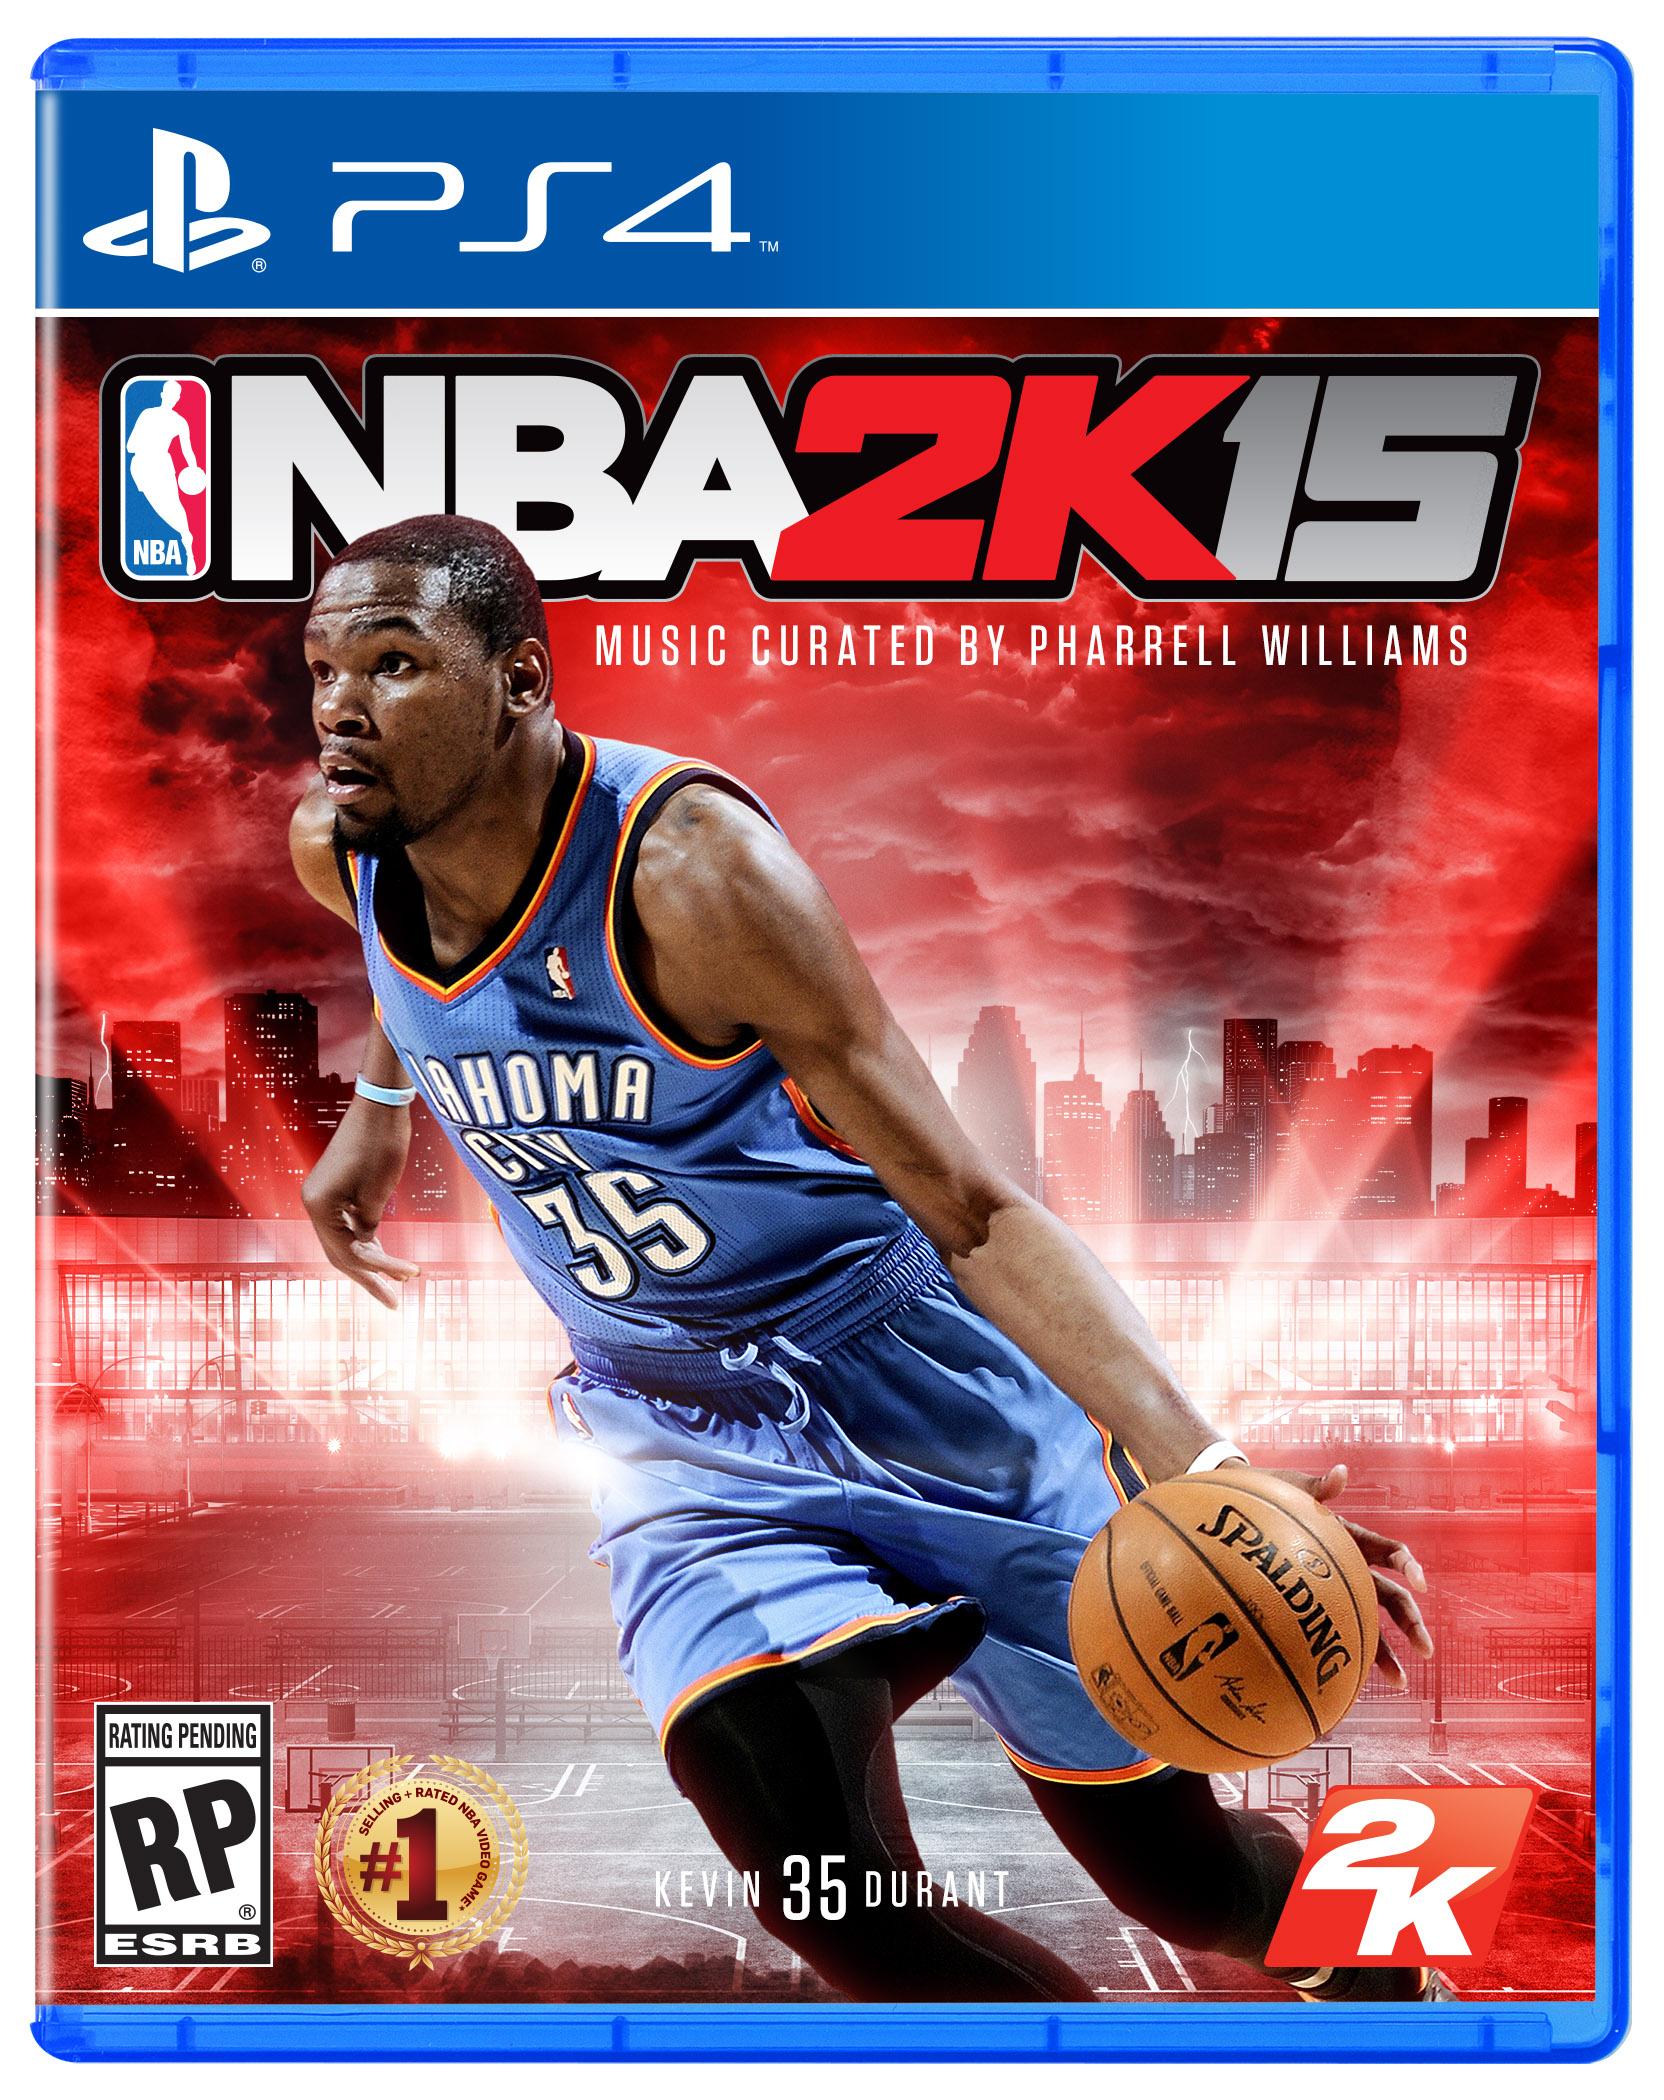 OKC Thunder: Here's Kevin Durant on the cover of NBA2K15 ... Jabari Parker Shoes